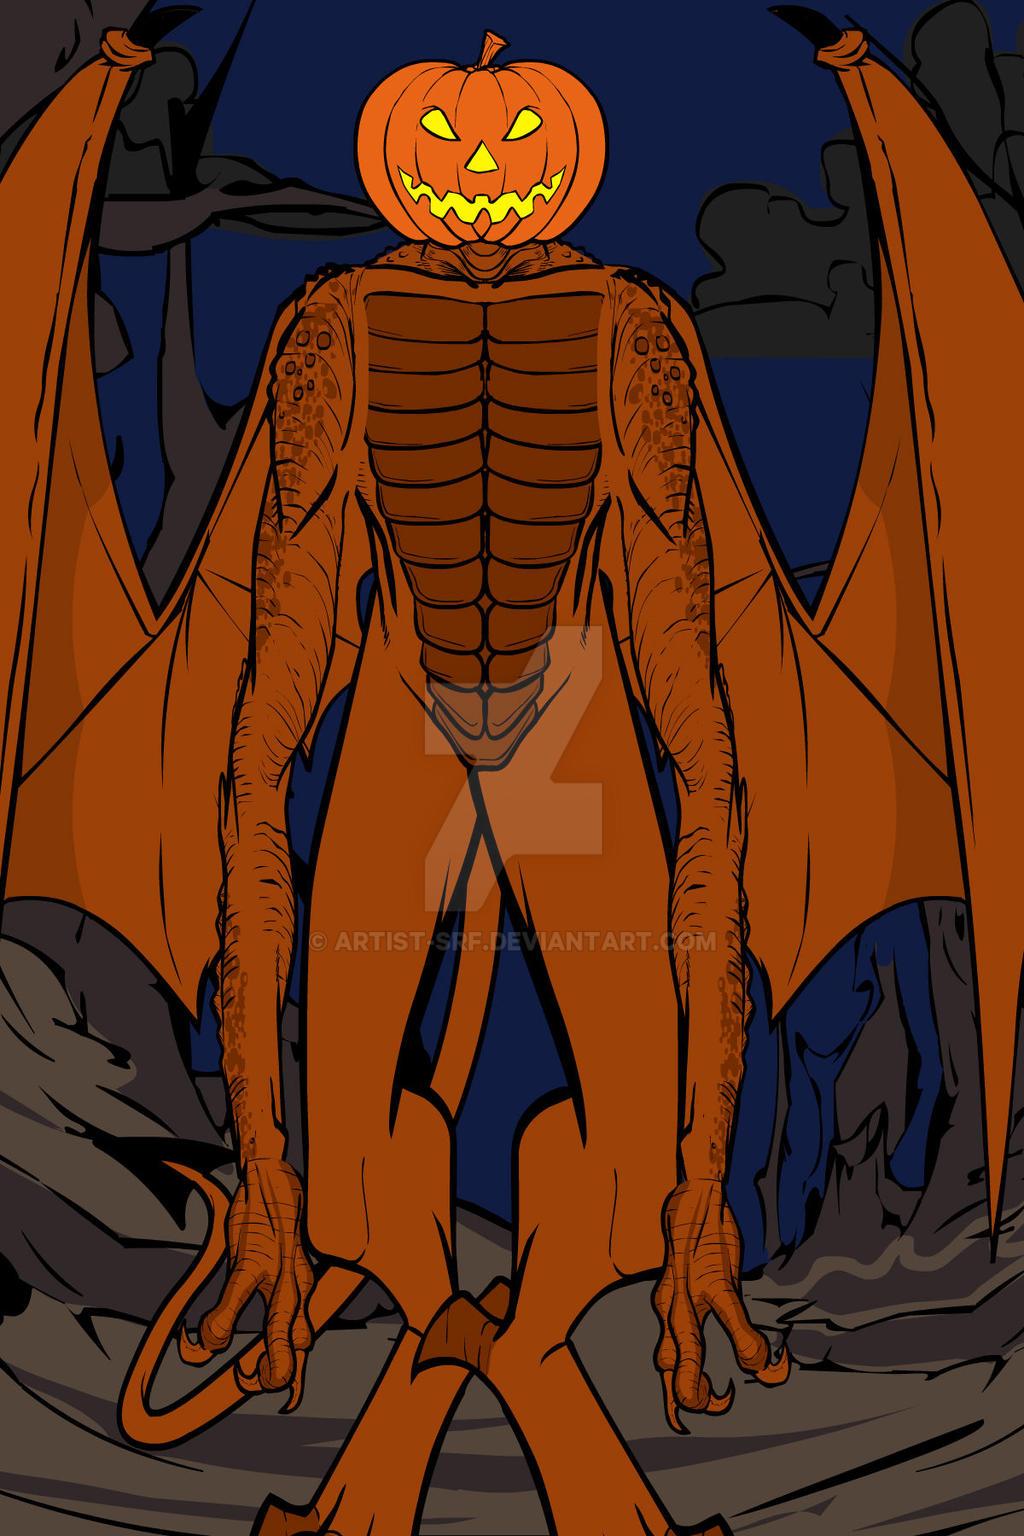 Heromachine: Pumpkinhead by ARTIST-SRF